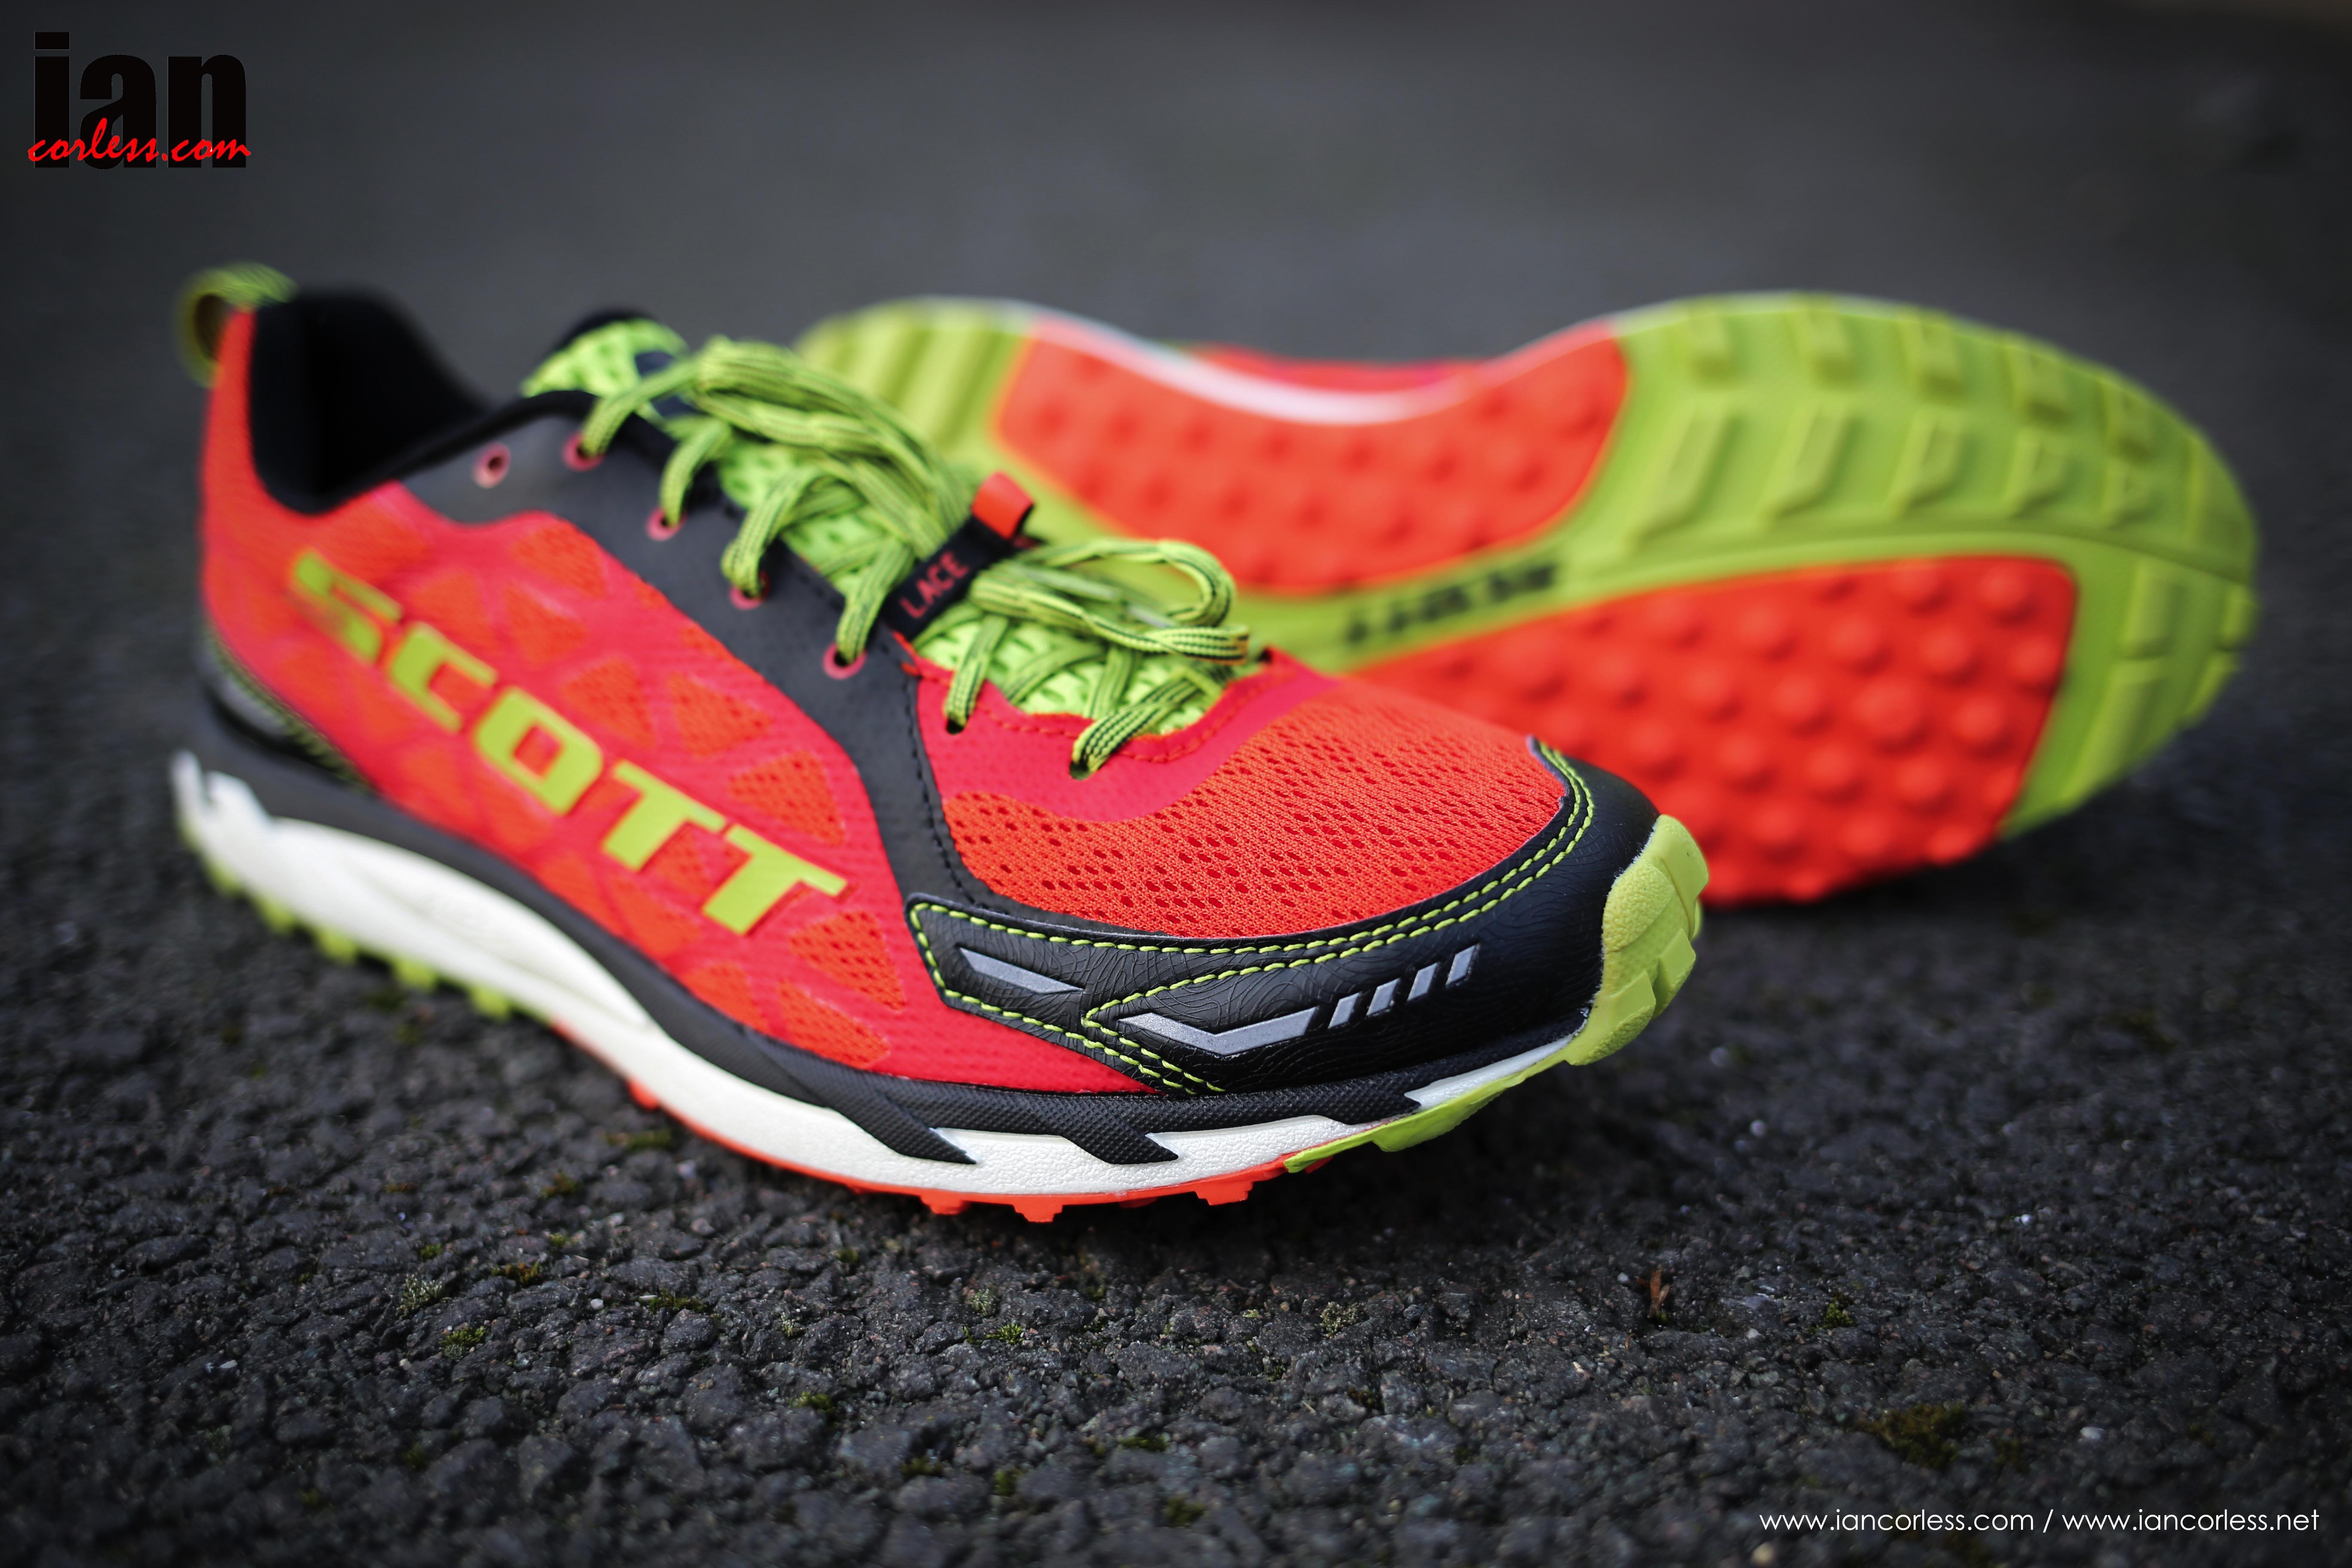 Scott Trail Rocket 2 0 2015 Shoe Review Iancorless Com